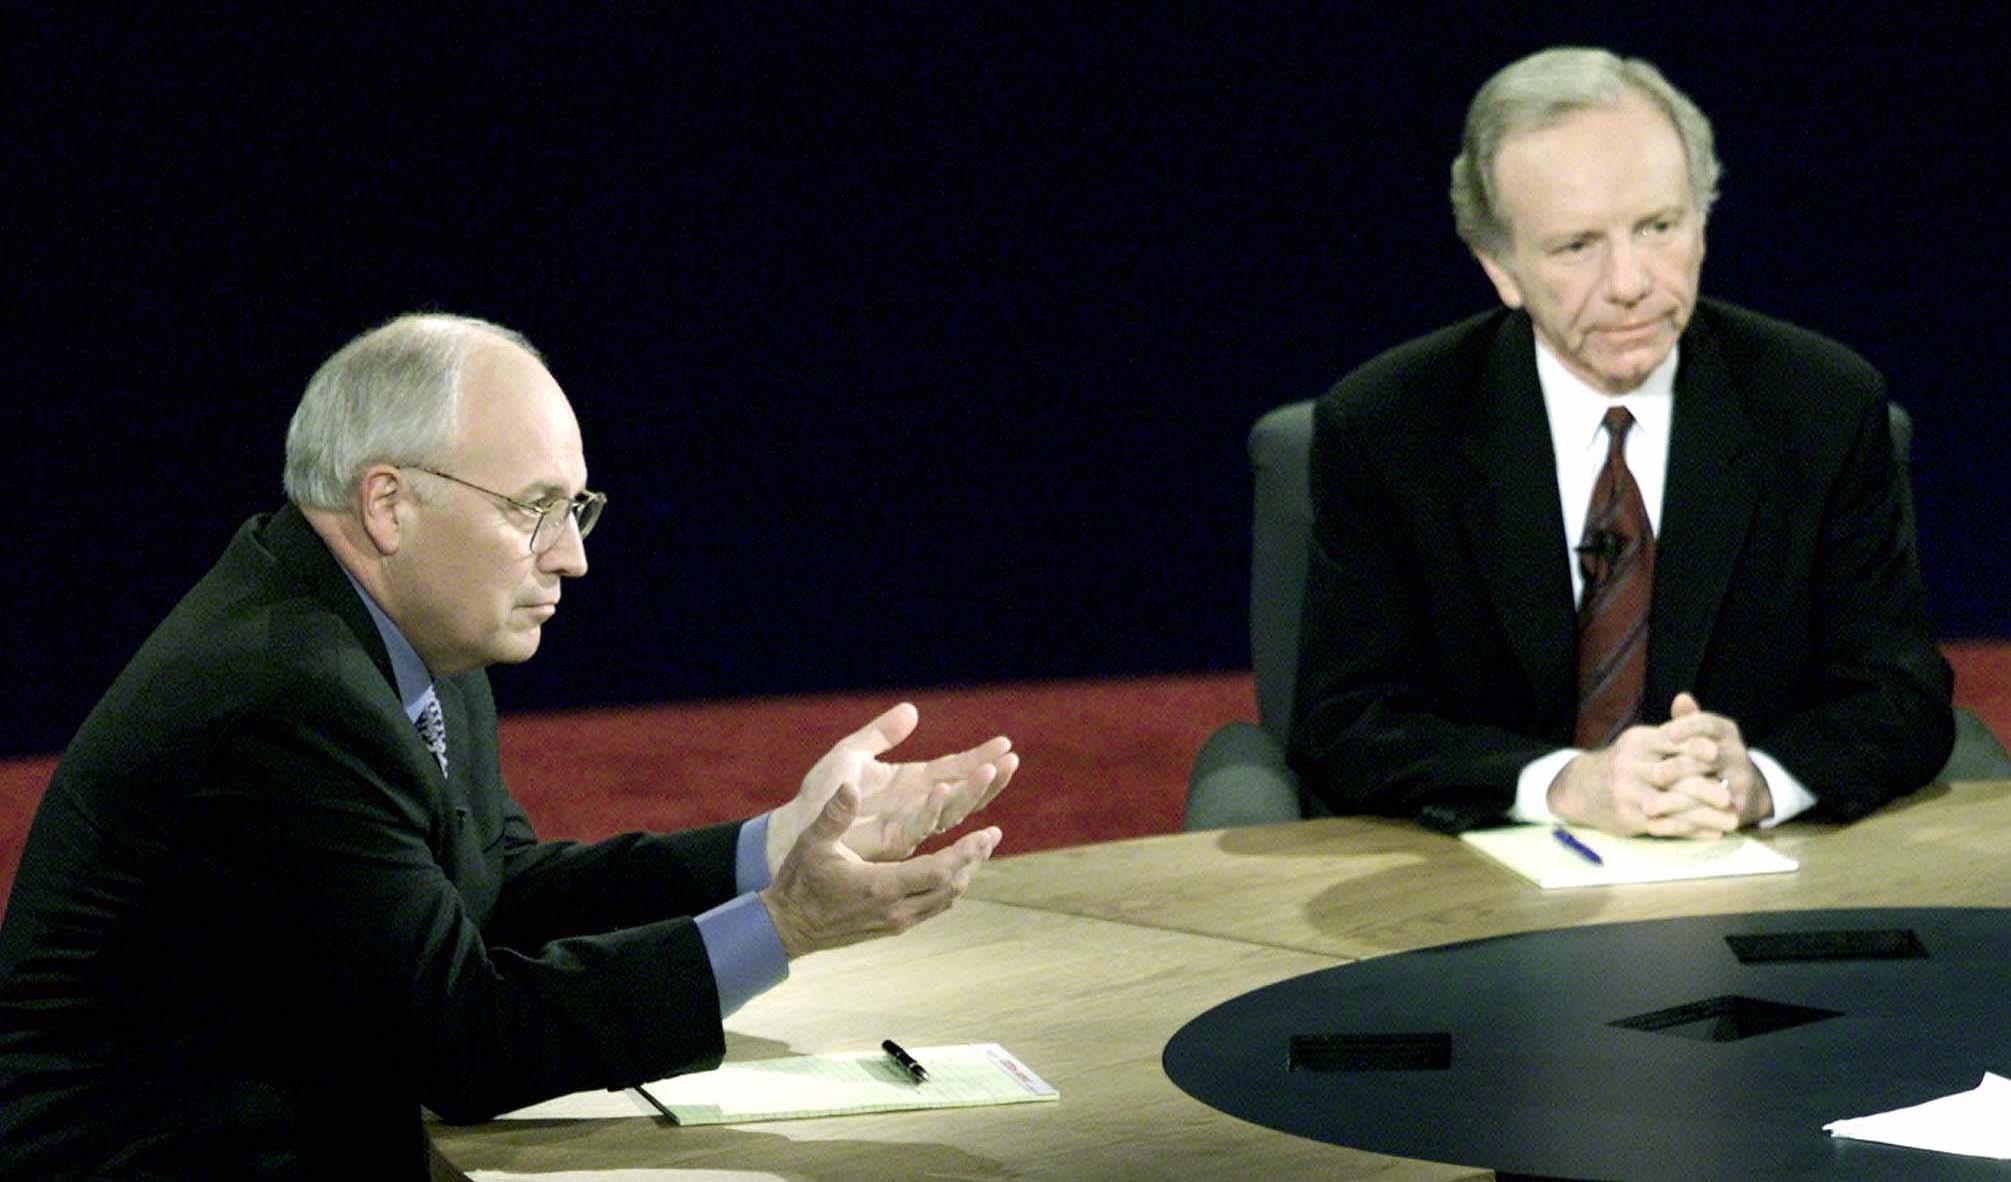 Cheney vs. Lieberman: The 2000 vice presidential debate